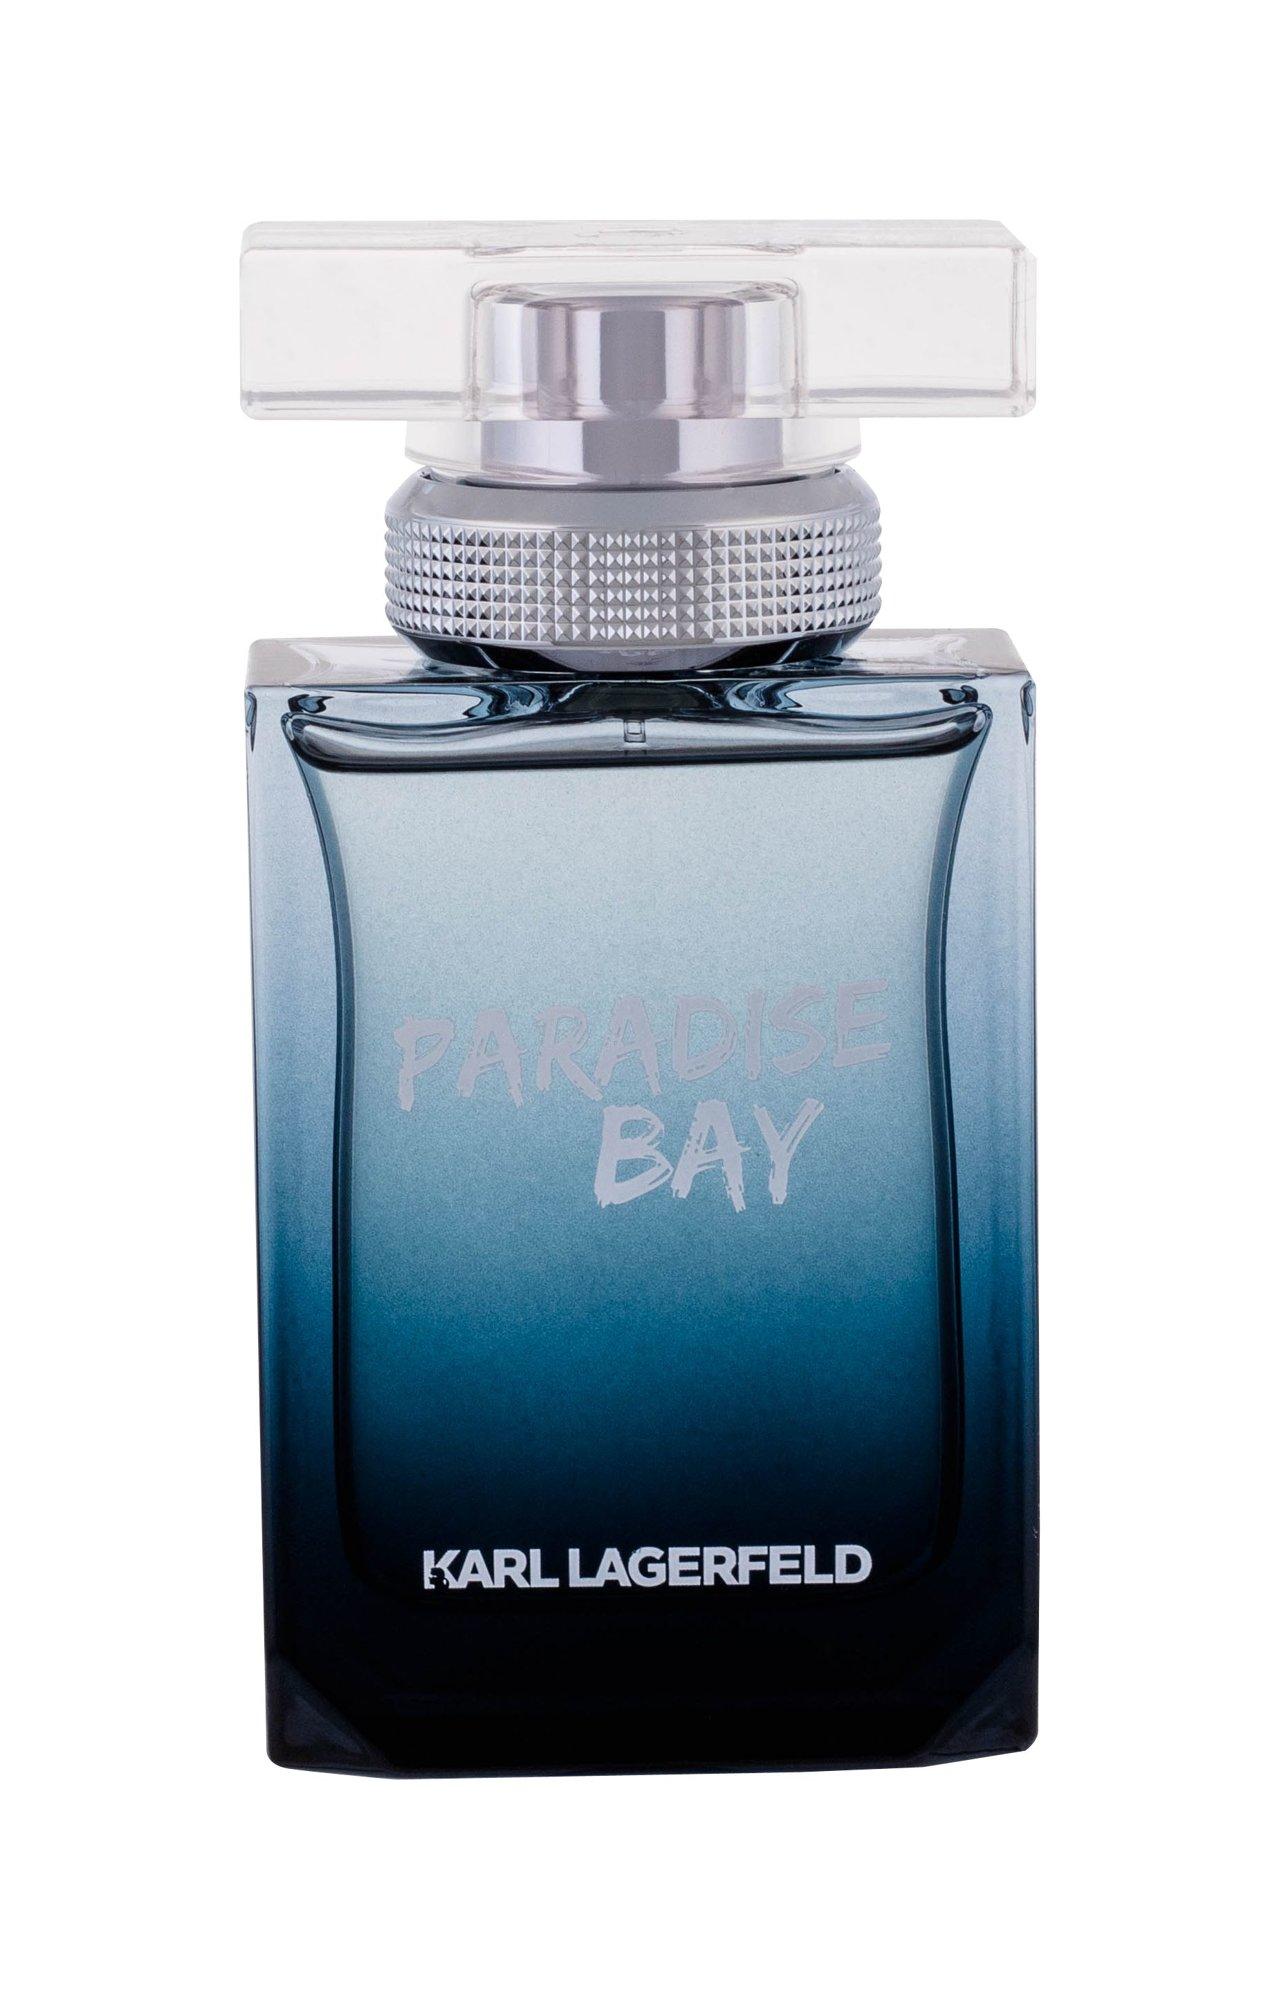 Karl Lagerfeld Karl Lagerfeld Paradise Bay EDT 50ml